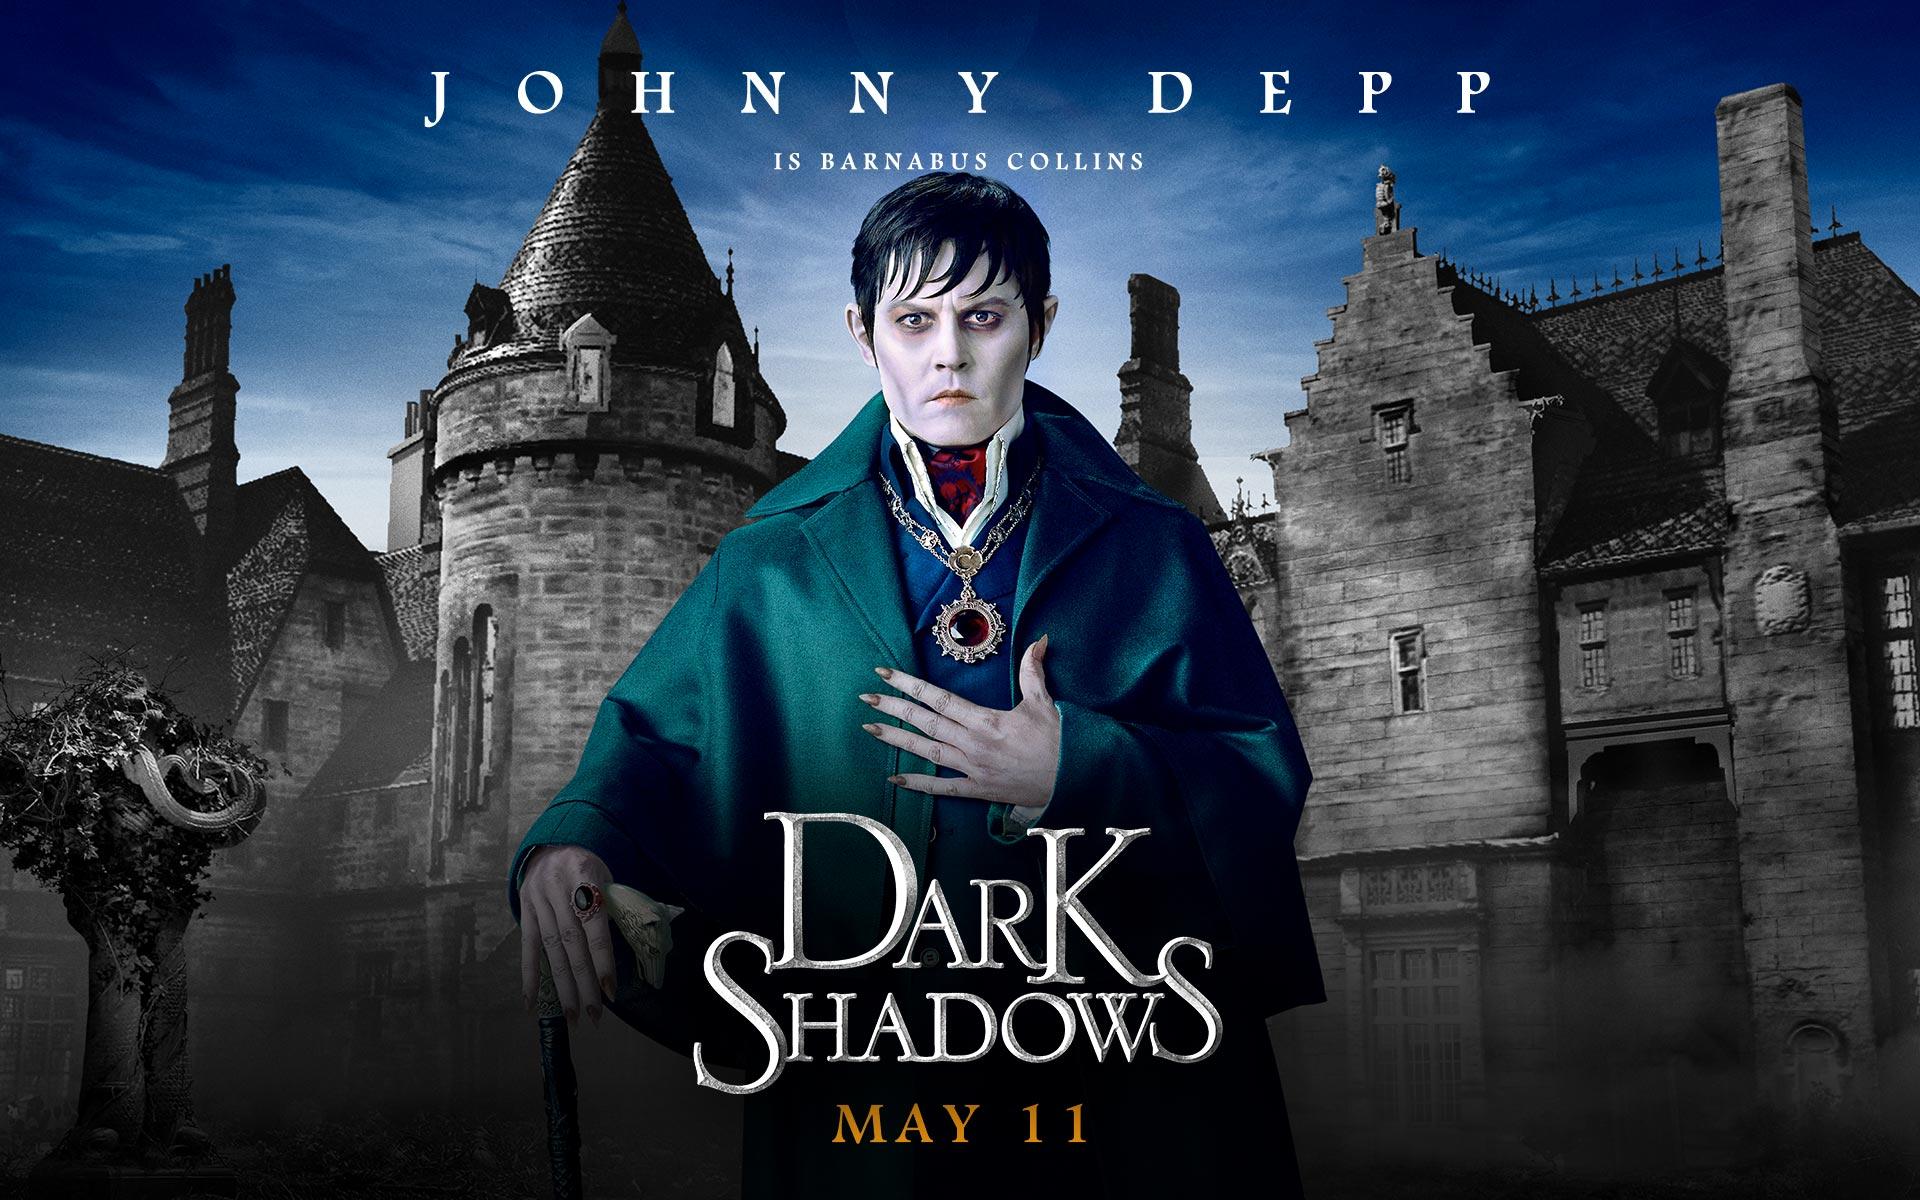 Fond dcran Dark Shadows Affiche gratuit fonds cran Dark Shadows 1920x1200